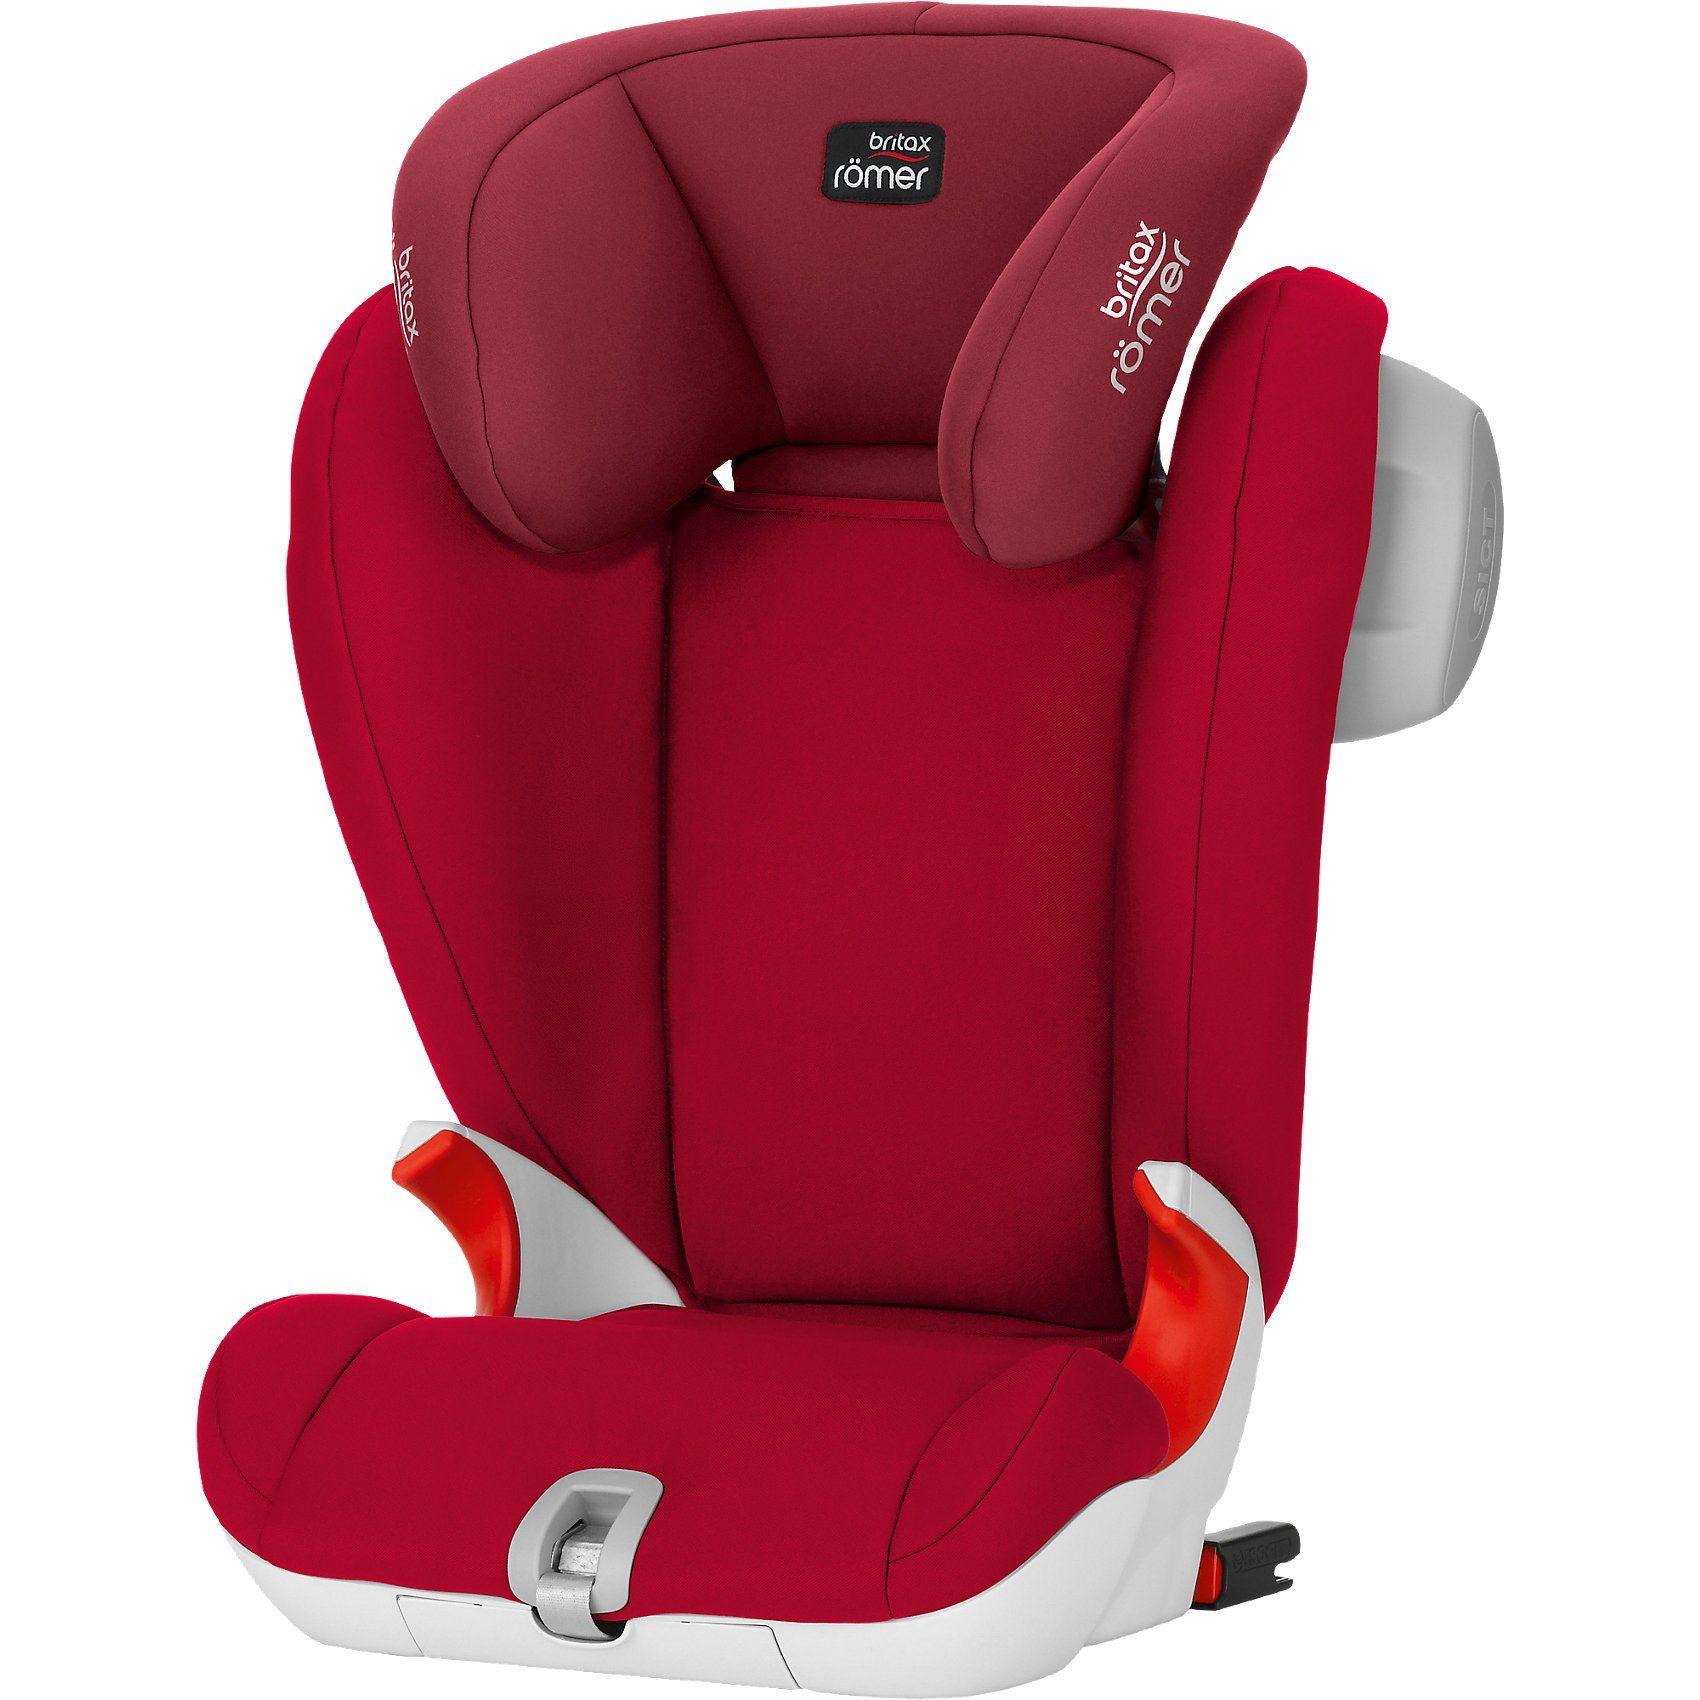 BRITAX RÖMER Auto-Kindersitz Kidfix SL Sict, Flame Red, 2018